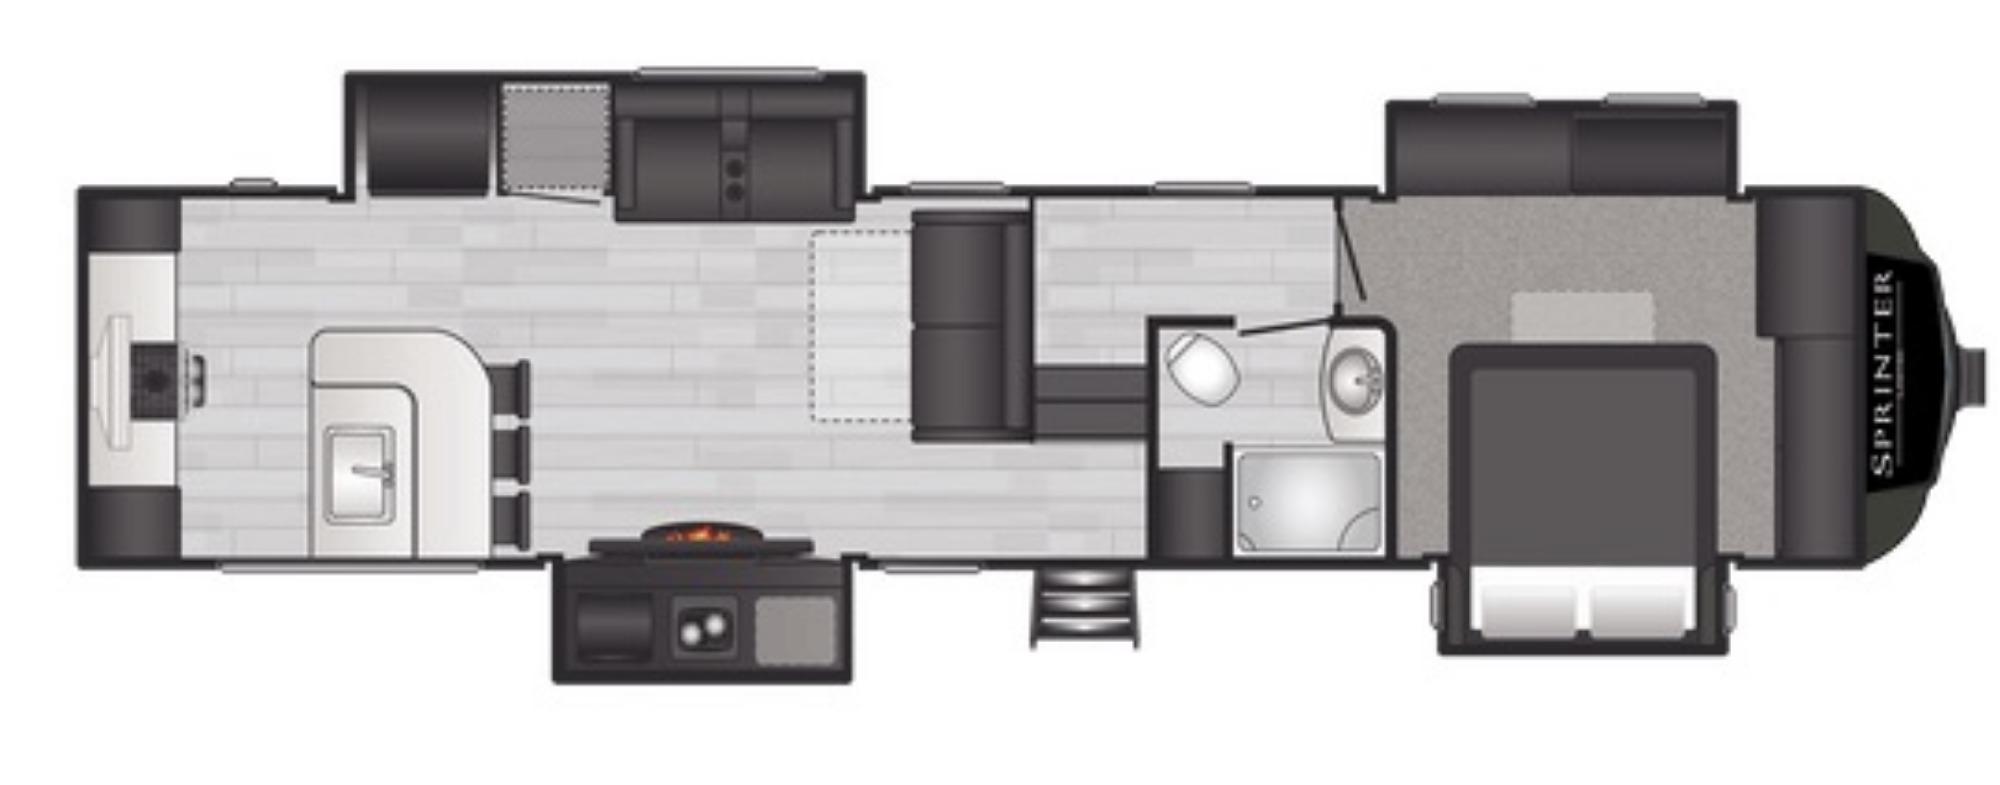 View Floor Plan for 2021 KEYSTONE SPRINTER LIMITED 3550FWMLS